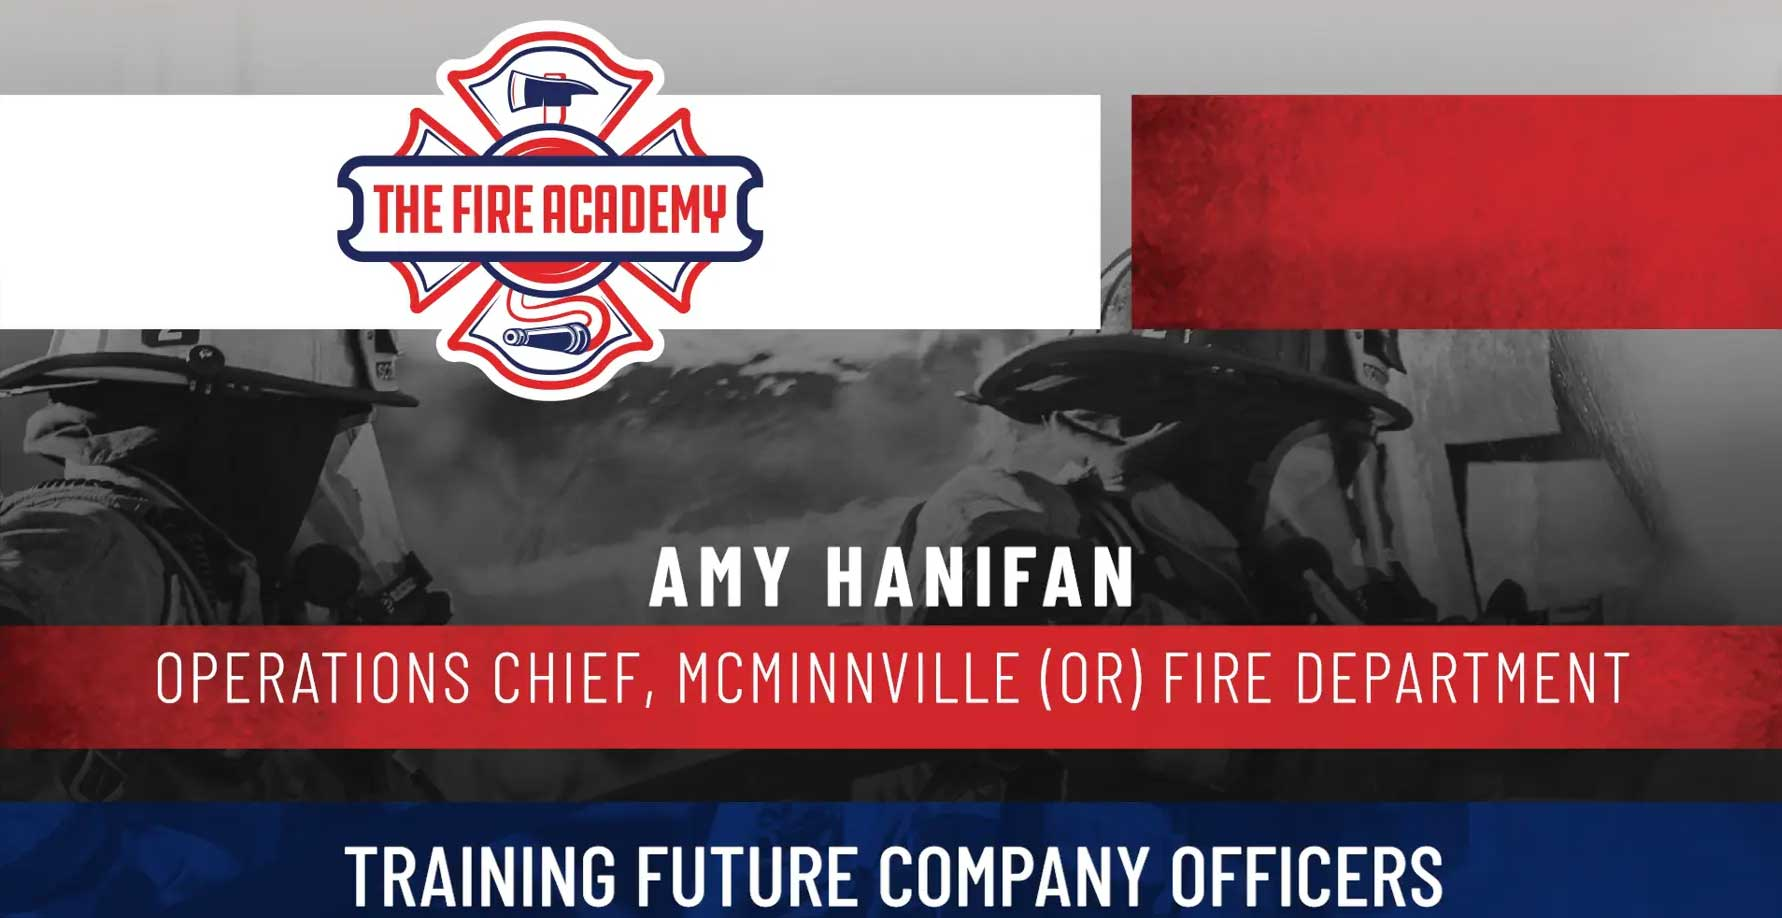 Training Future Company Officers